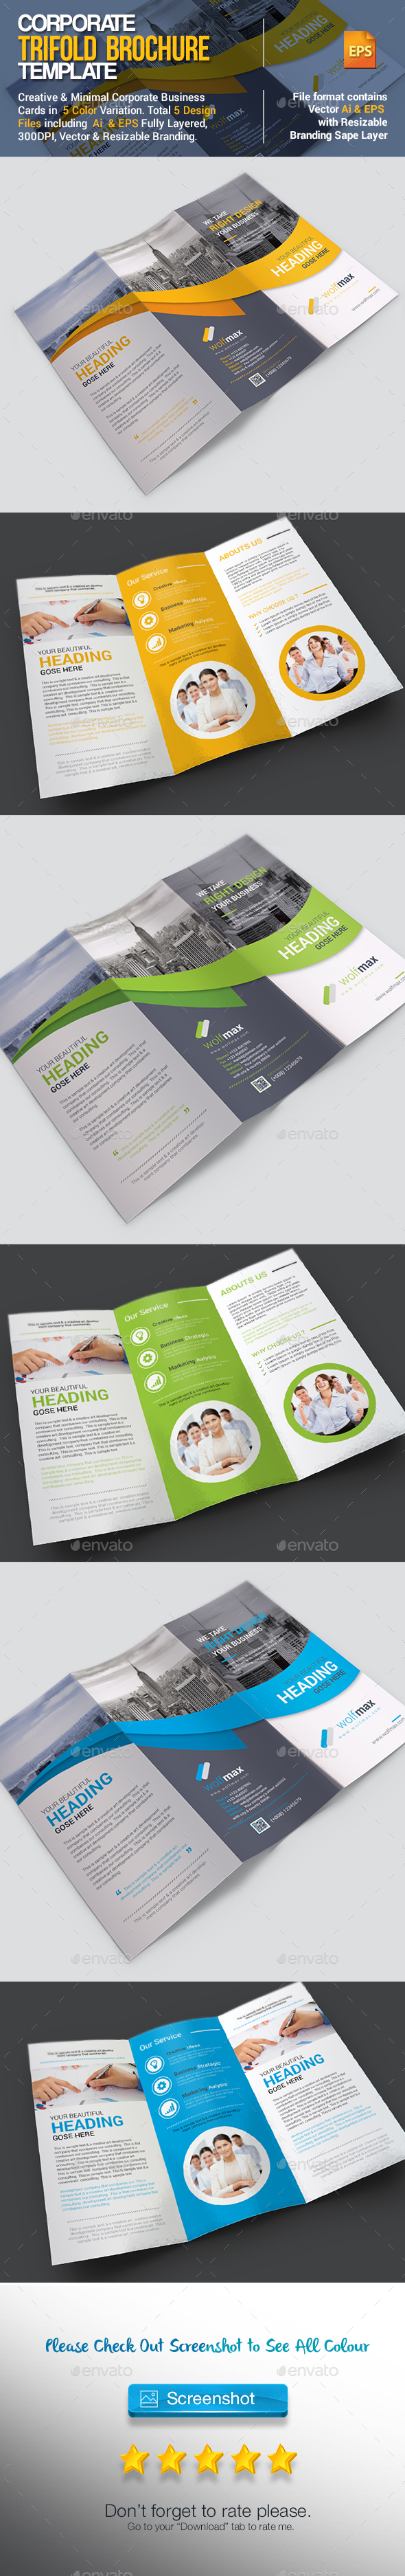 Corporate Tri-fold Brochure Template Vector EPS, AI Illustrator ...